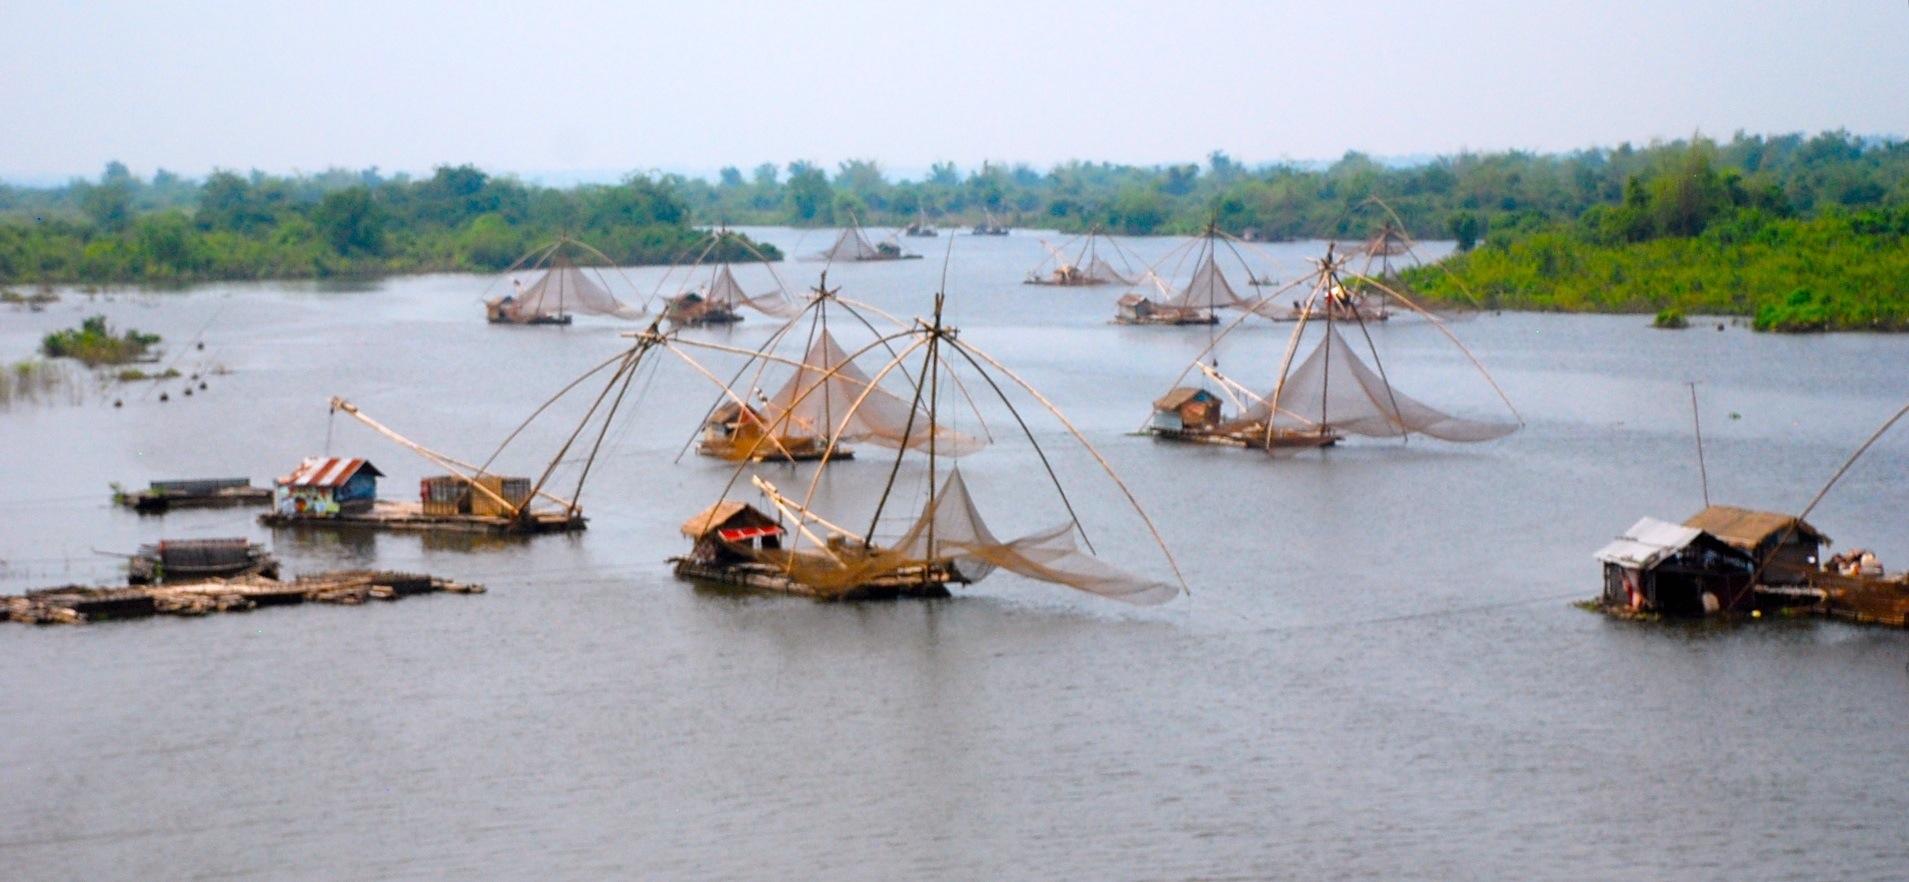 Kratie Cambodia  city images : Kratie | Cambodia Destinations | Viet Holiday Travel